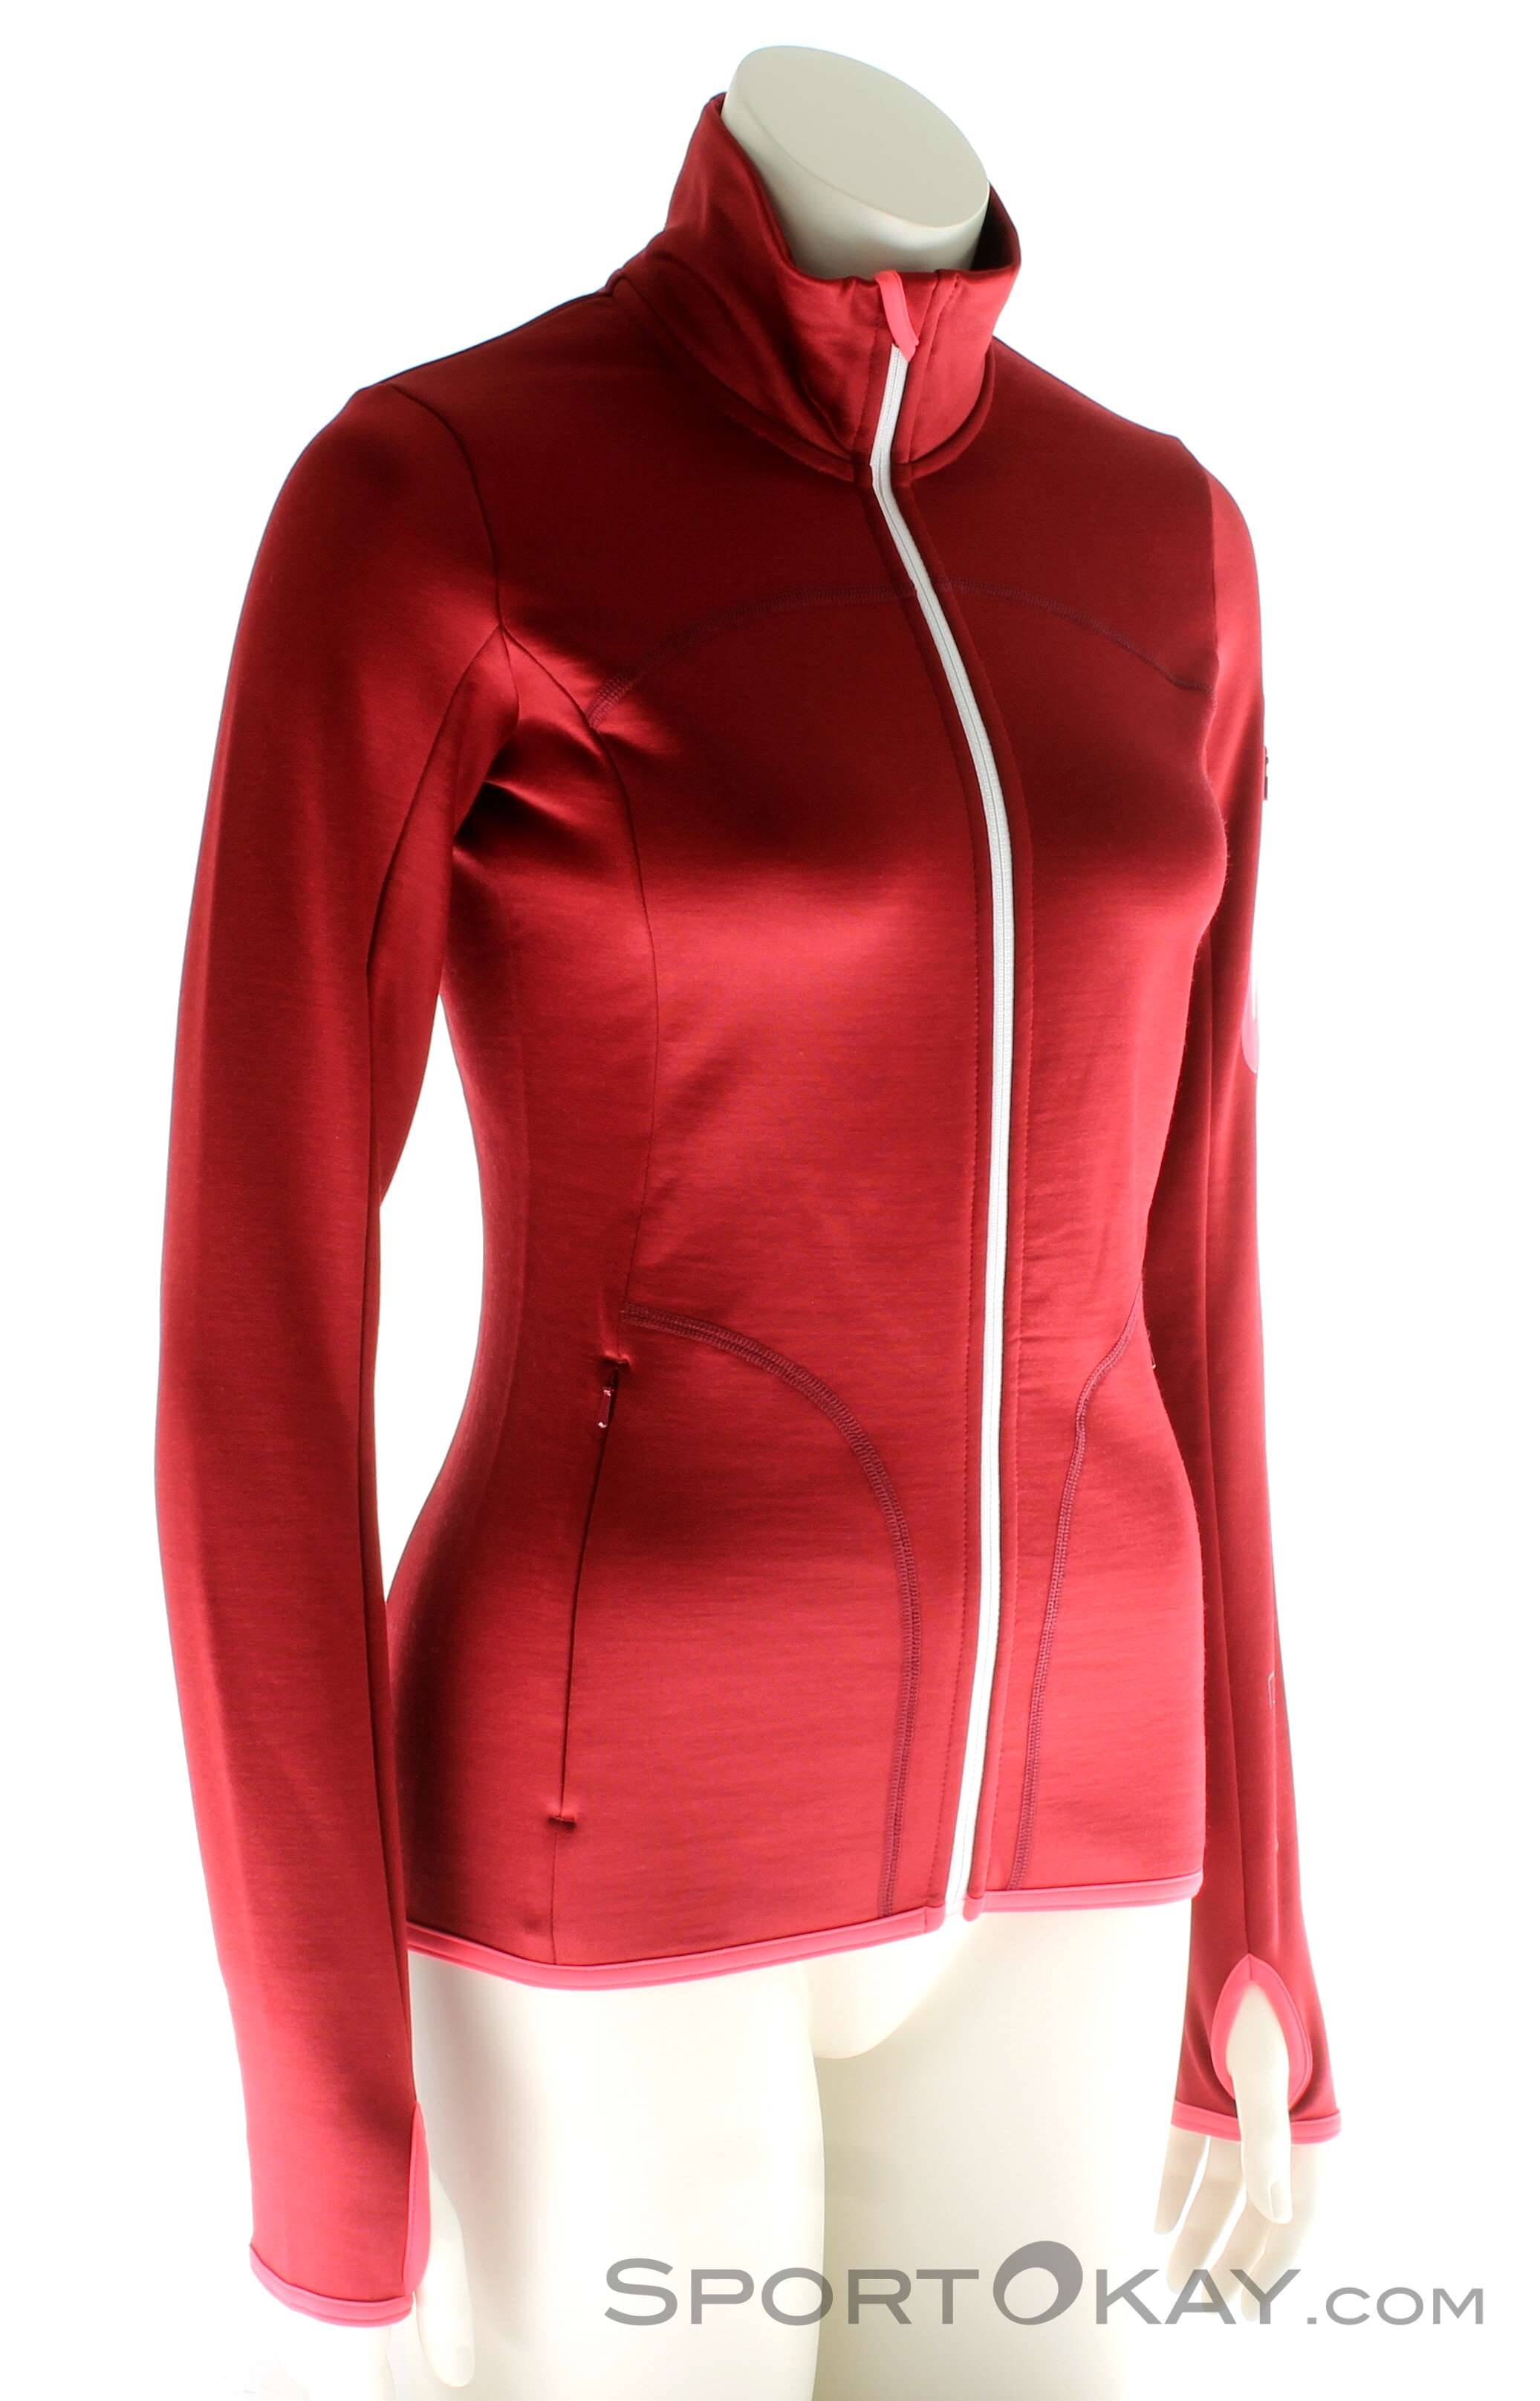 Ortovox Fleece Jacket Damen Tourensweater, Ortovox, Rot, , Damen, 0016-10580, 5637562644, 4250875282261, N1-01.jpg